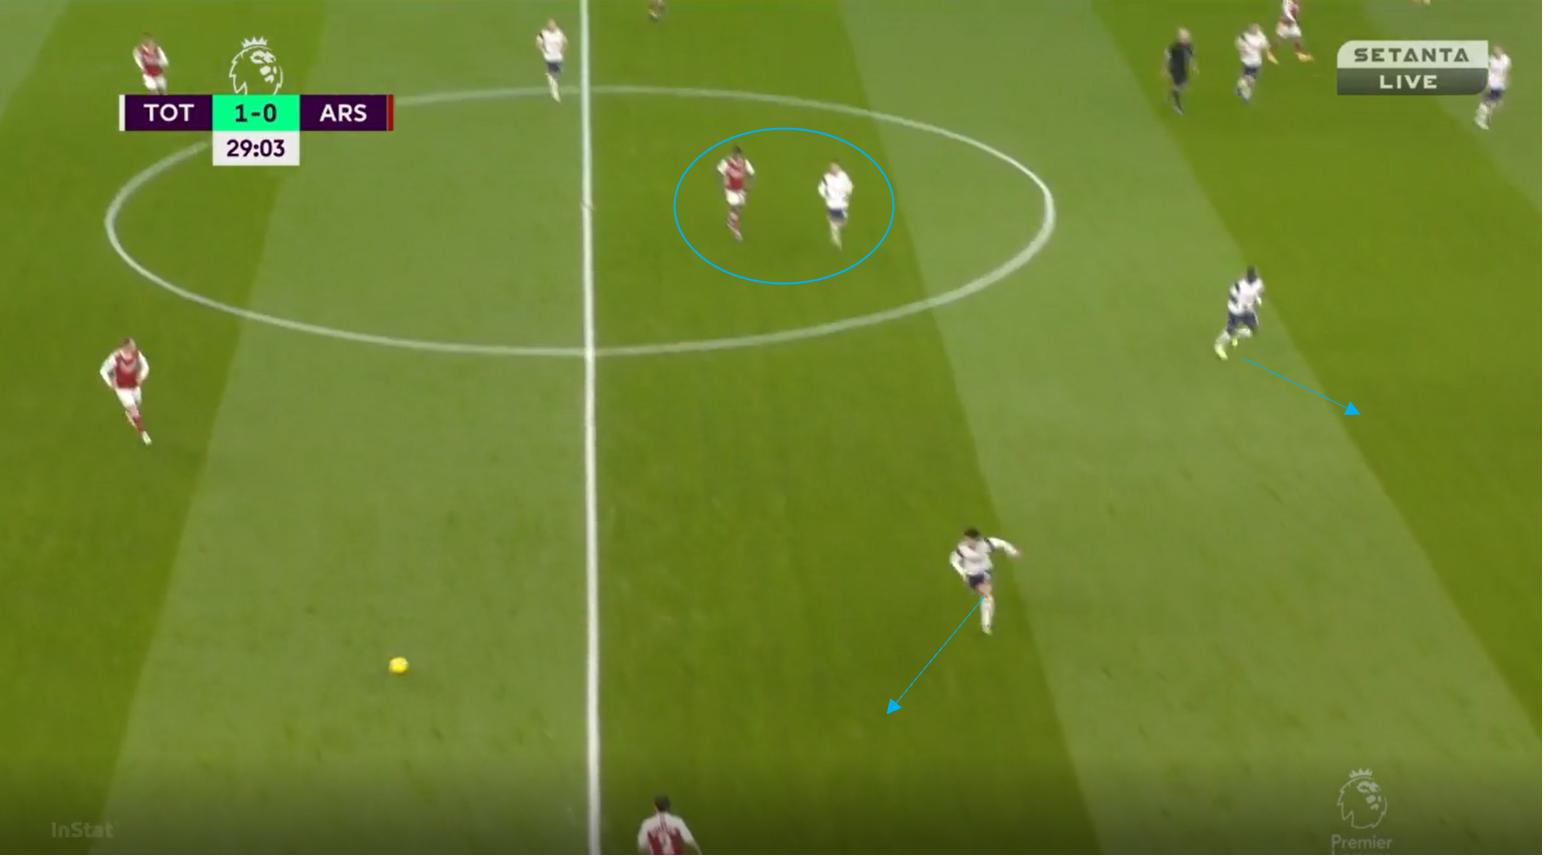 Premier League 2020/21: Tottenham vs Arsenal- tactical analysis tactics